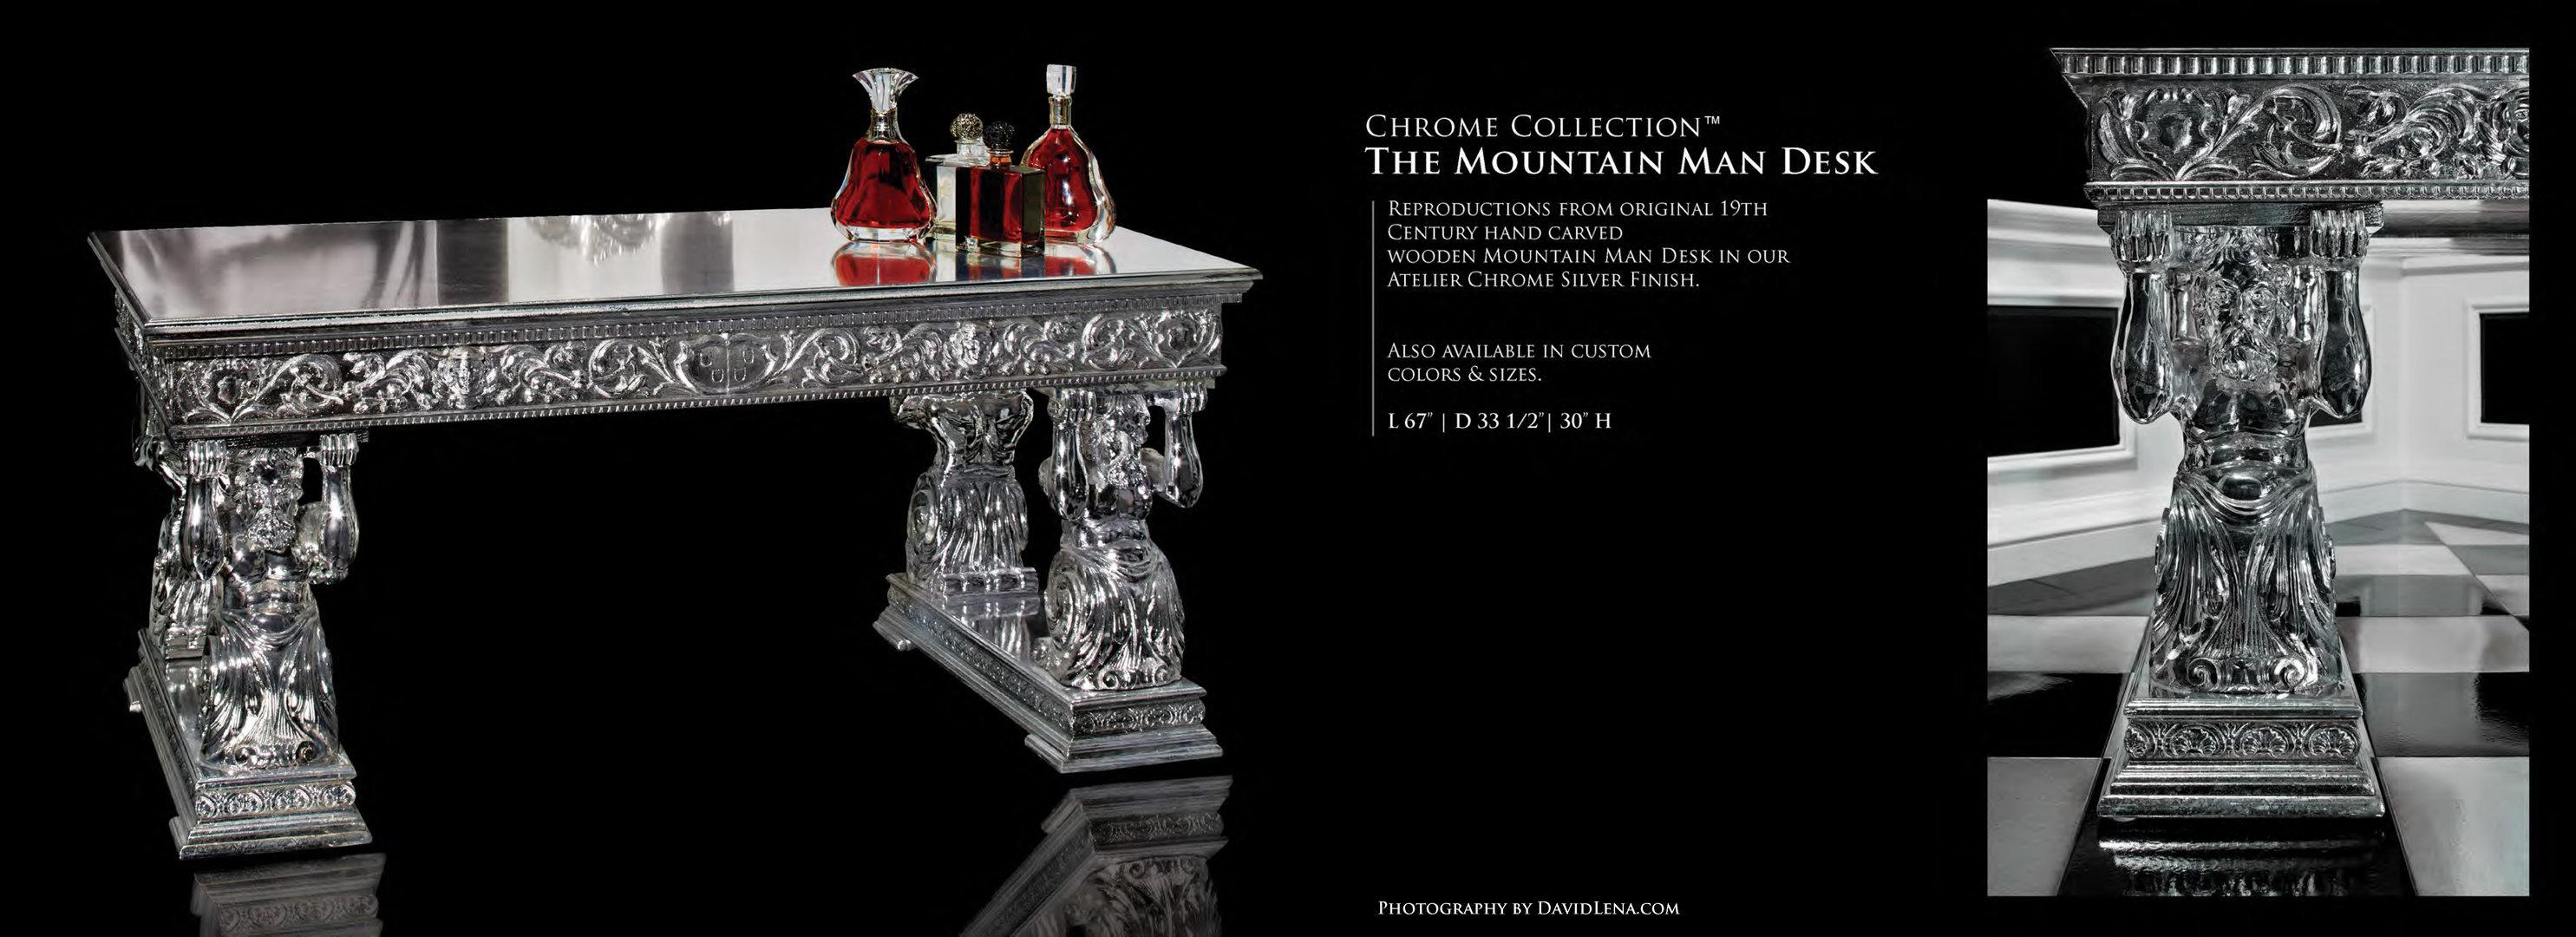 The Mountain Man Desk